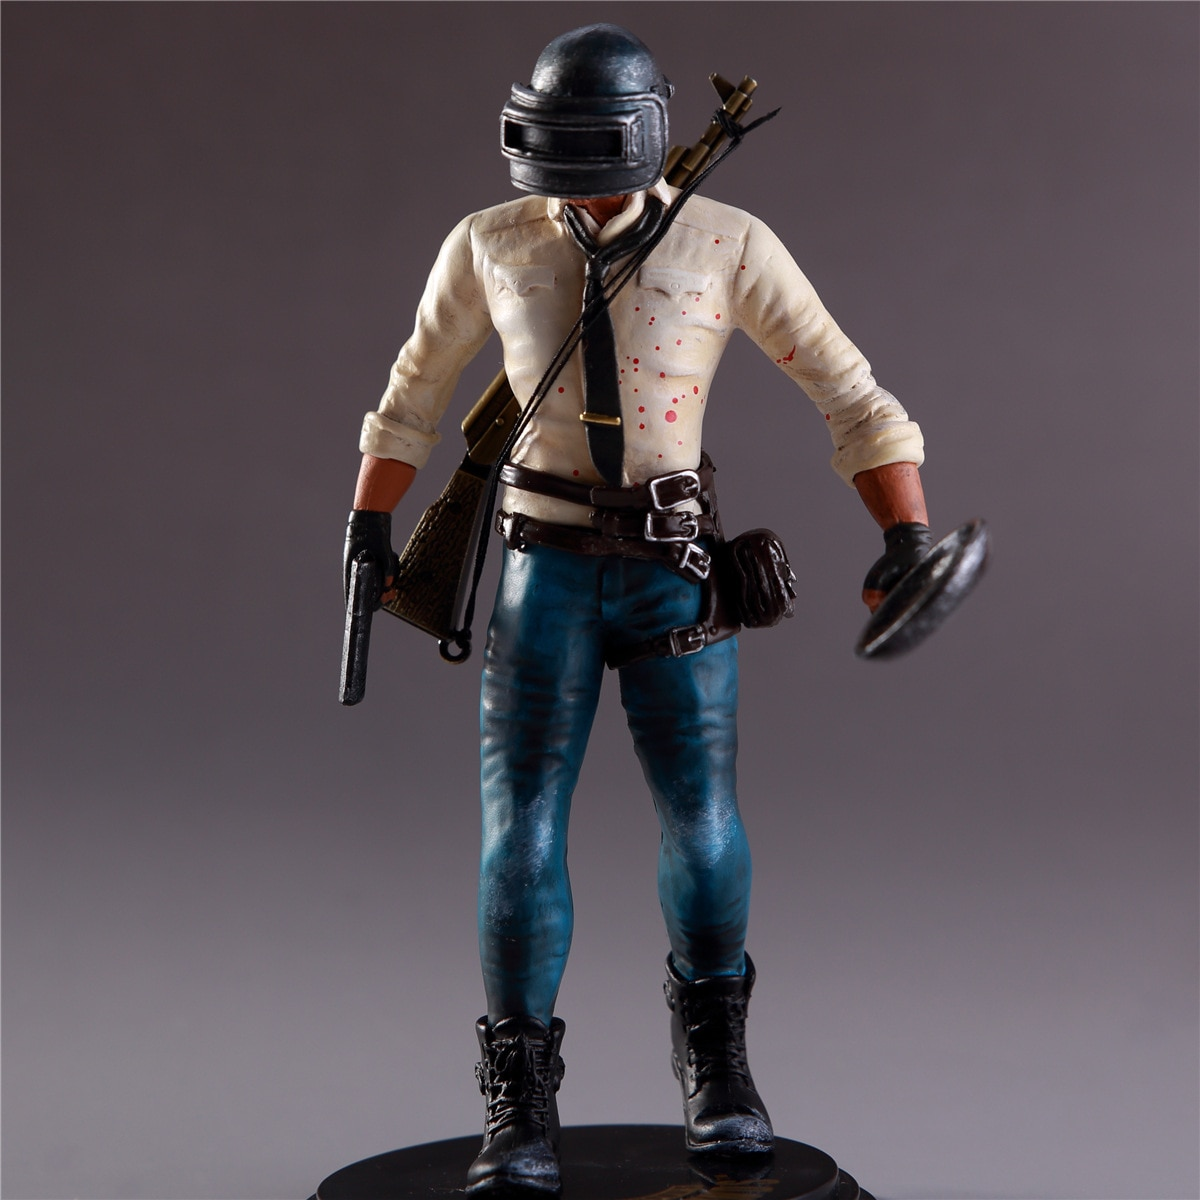 PUBG Playerunknowns BattleGrounds hombres/mujeres, figura de PVC, juguete de modelos coleccionables